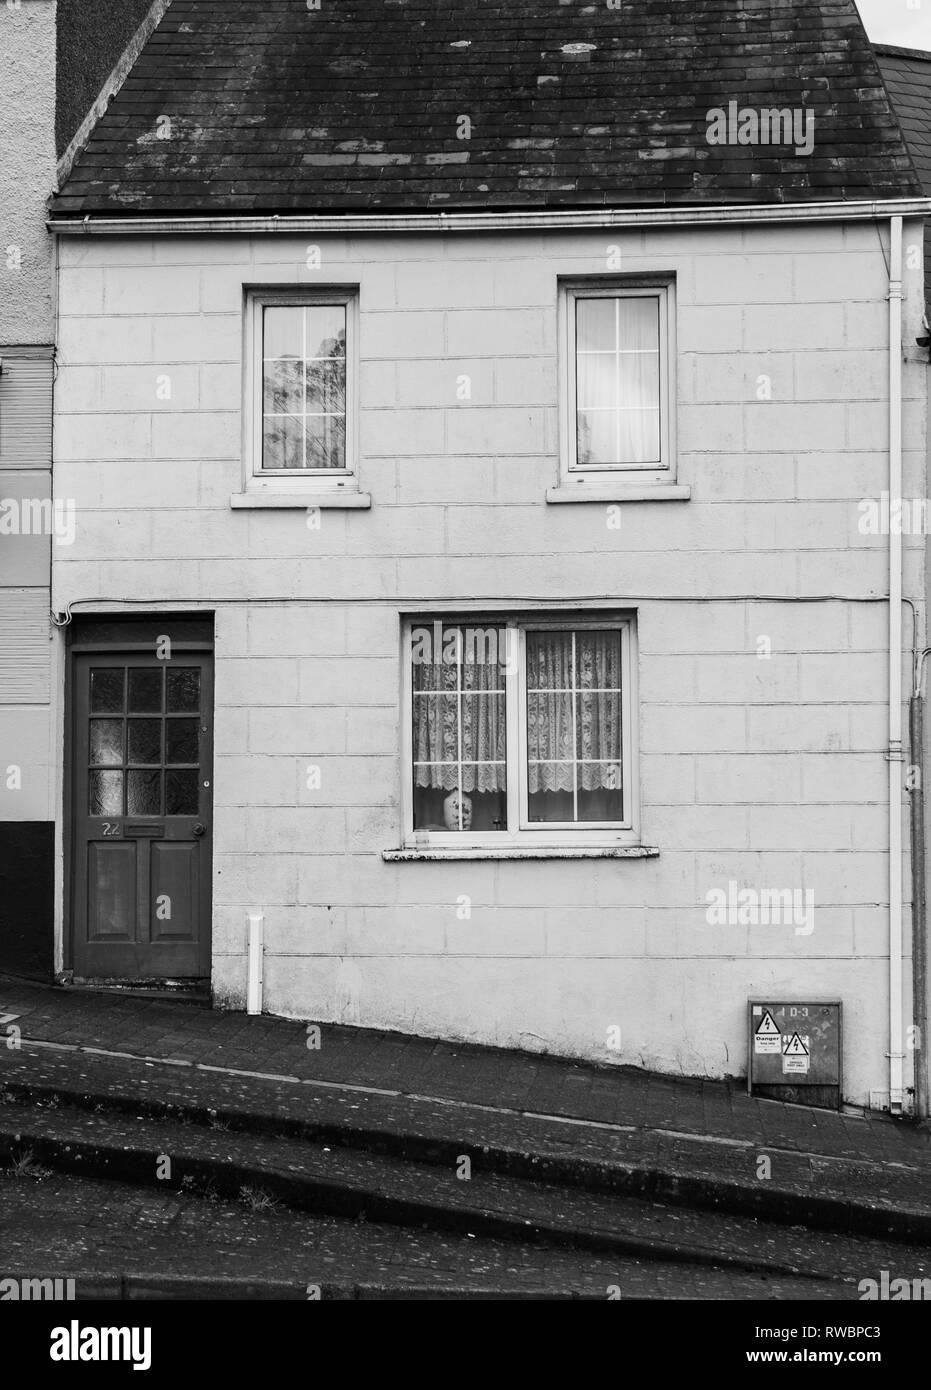 houses on steep hill bandon west cork ireland - Stock Image